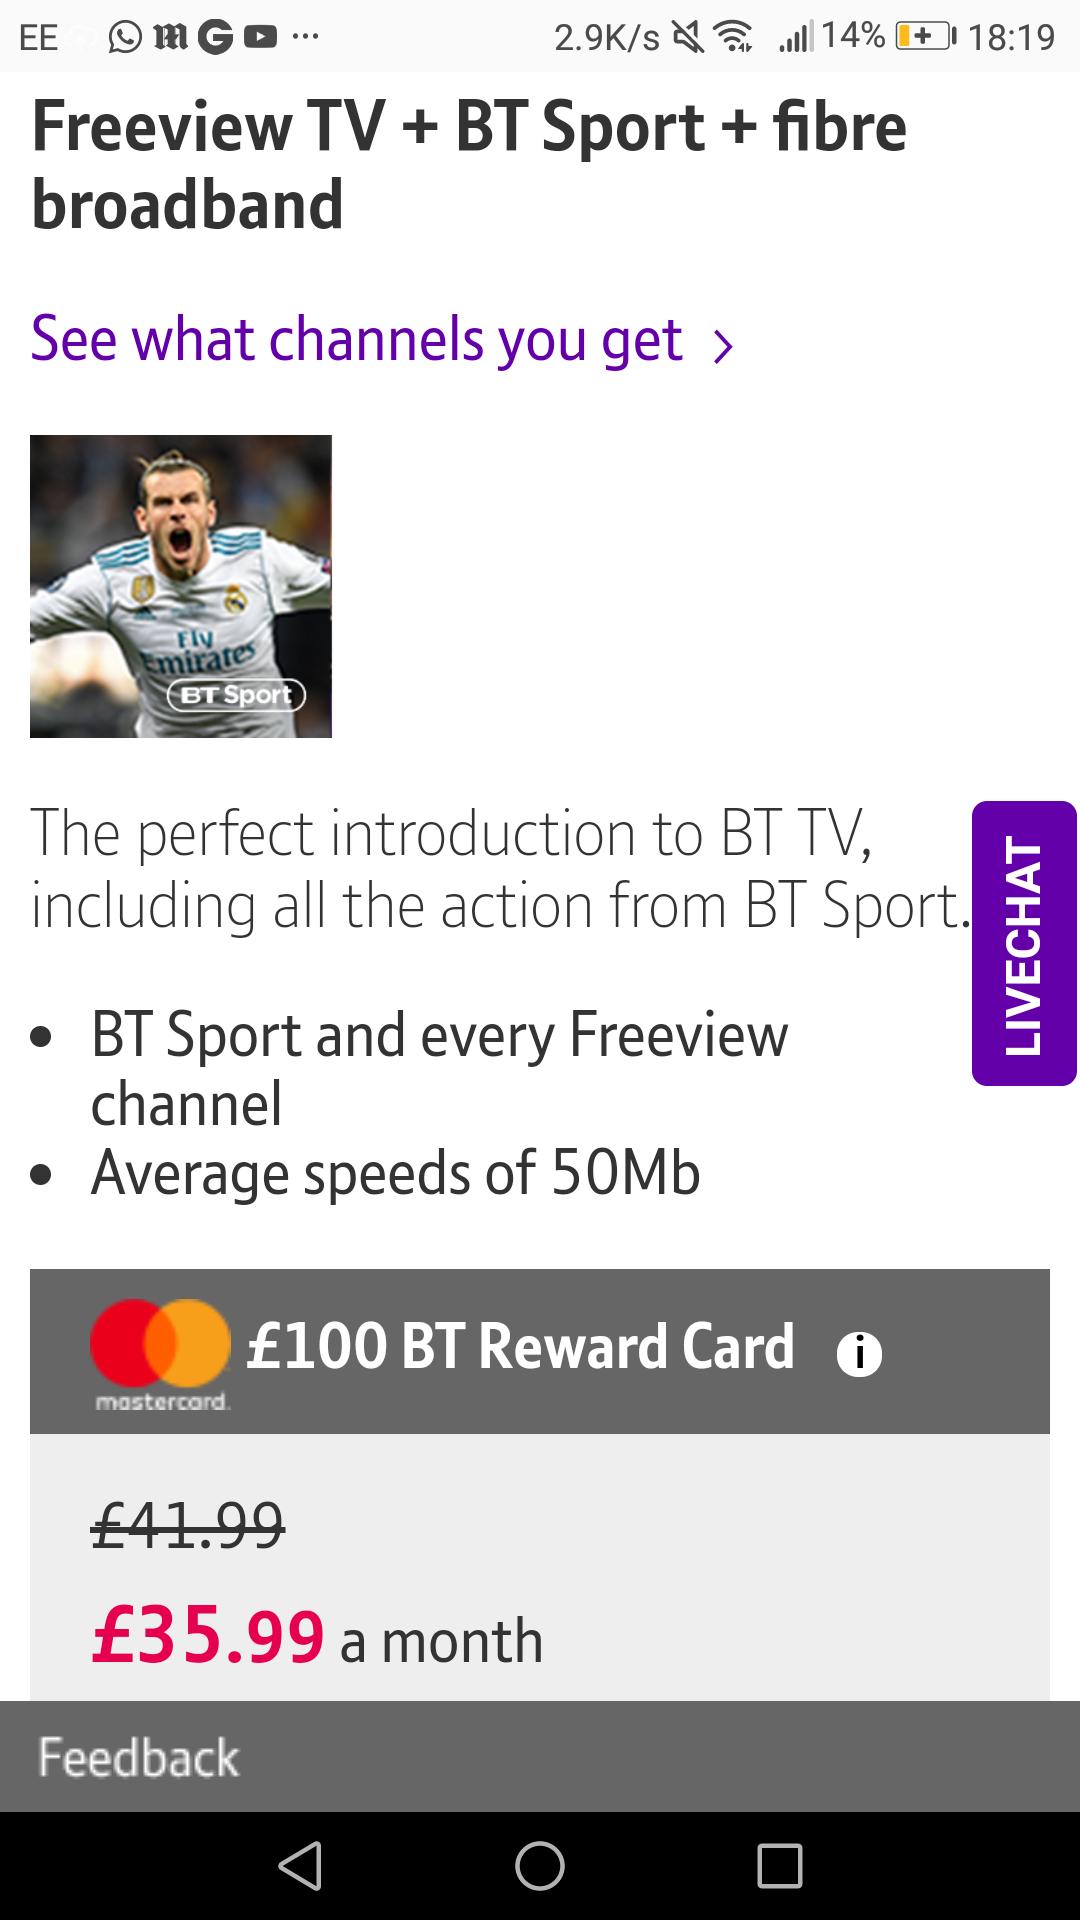 BT 50Mb fibre broadband & TV , including BT Sports. £100 cashback & free Amazon Echo £35.99pm  18m contract